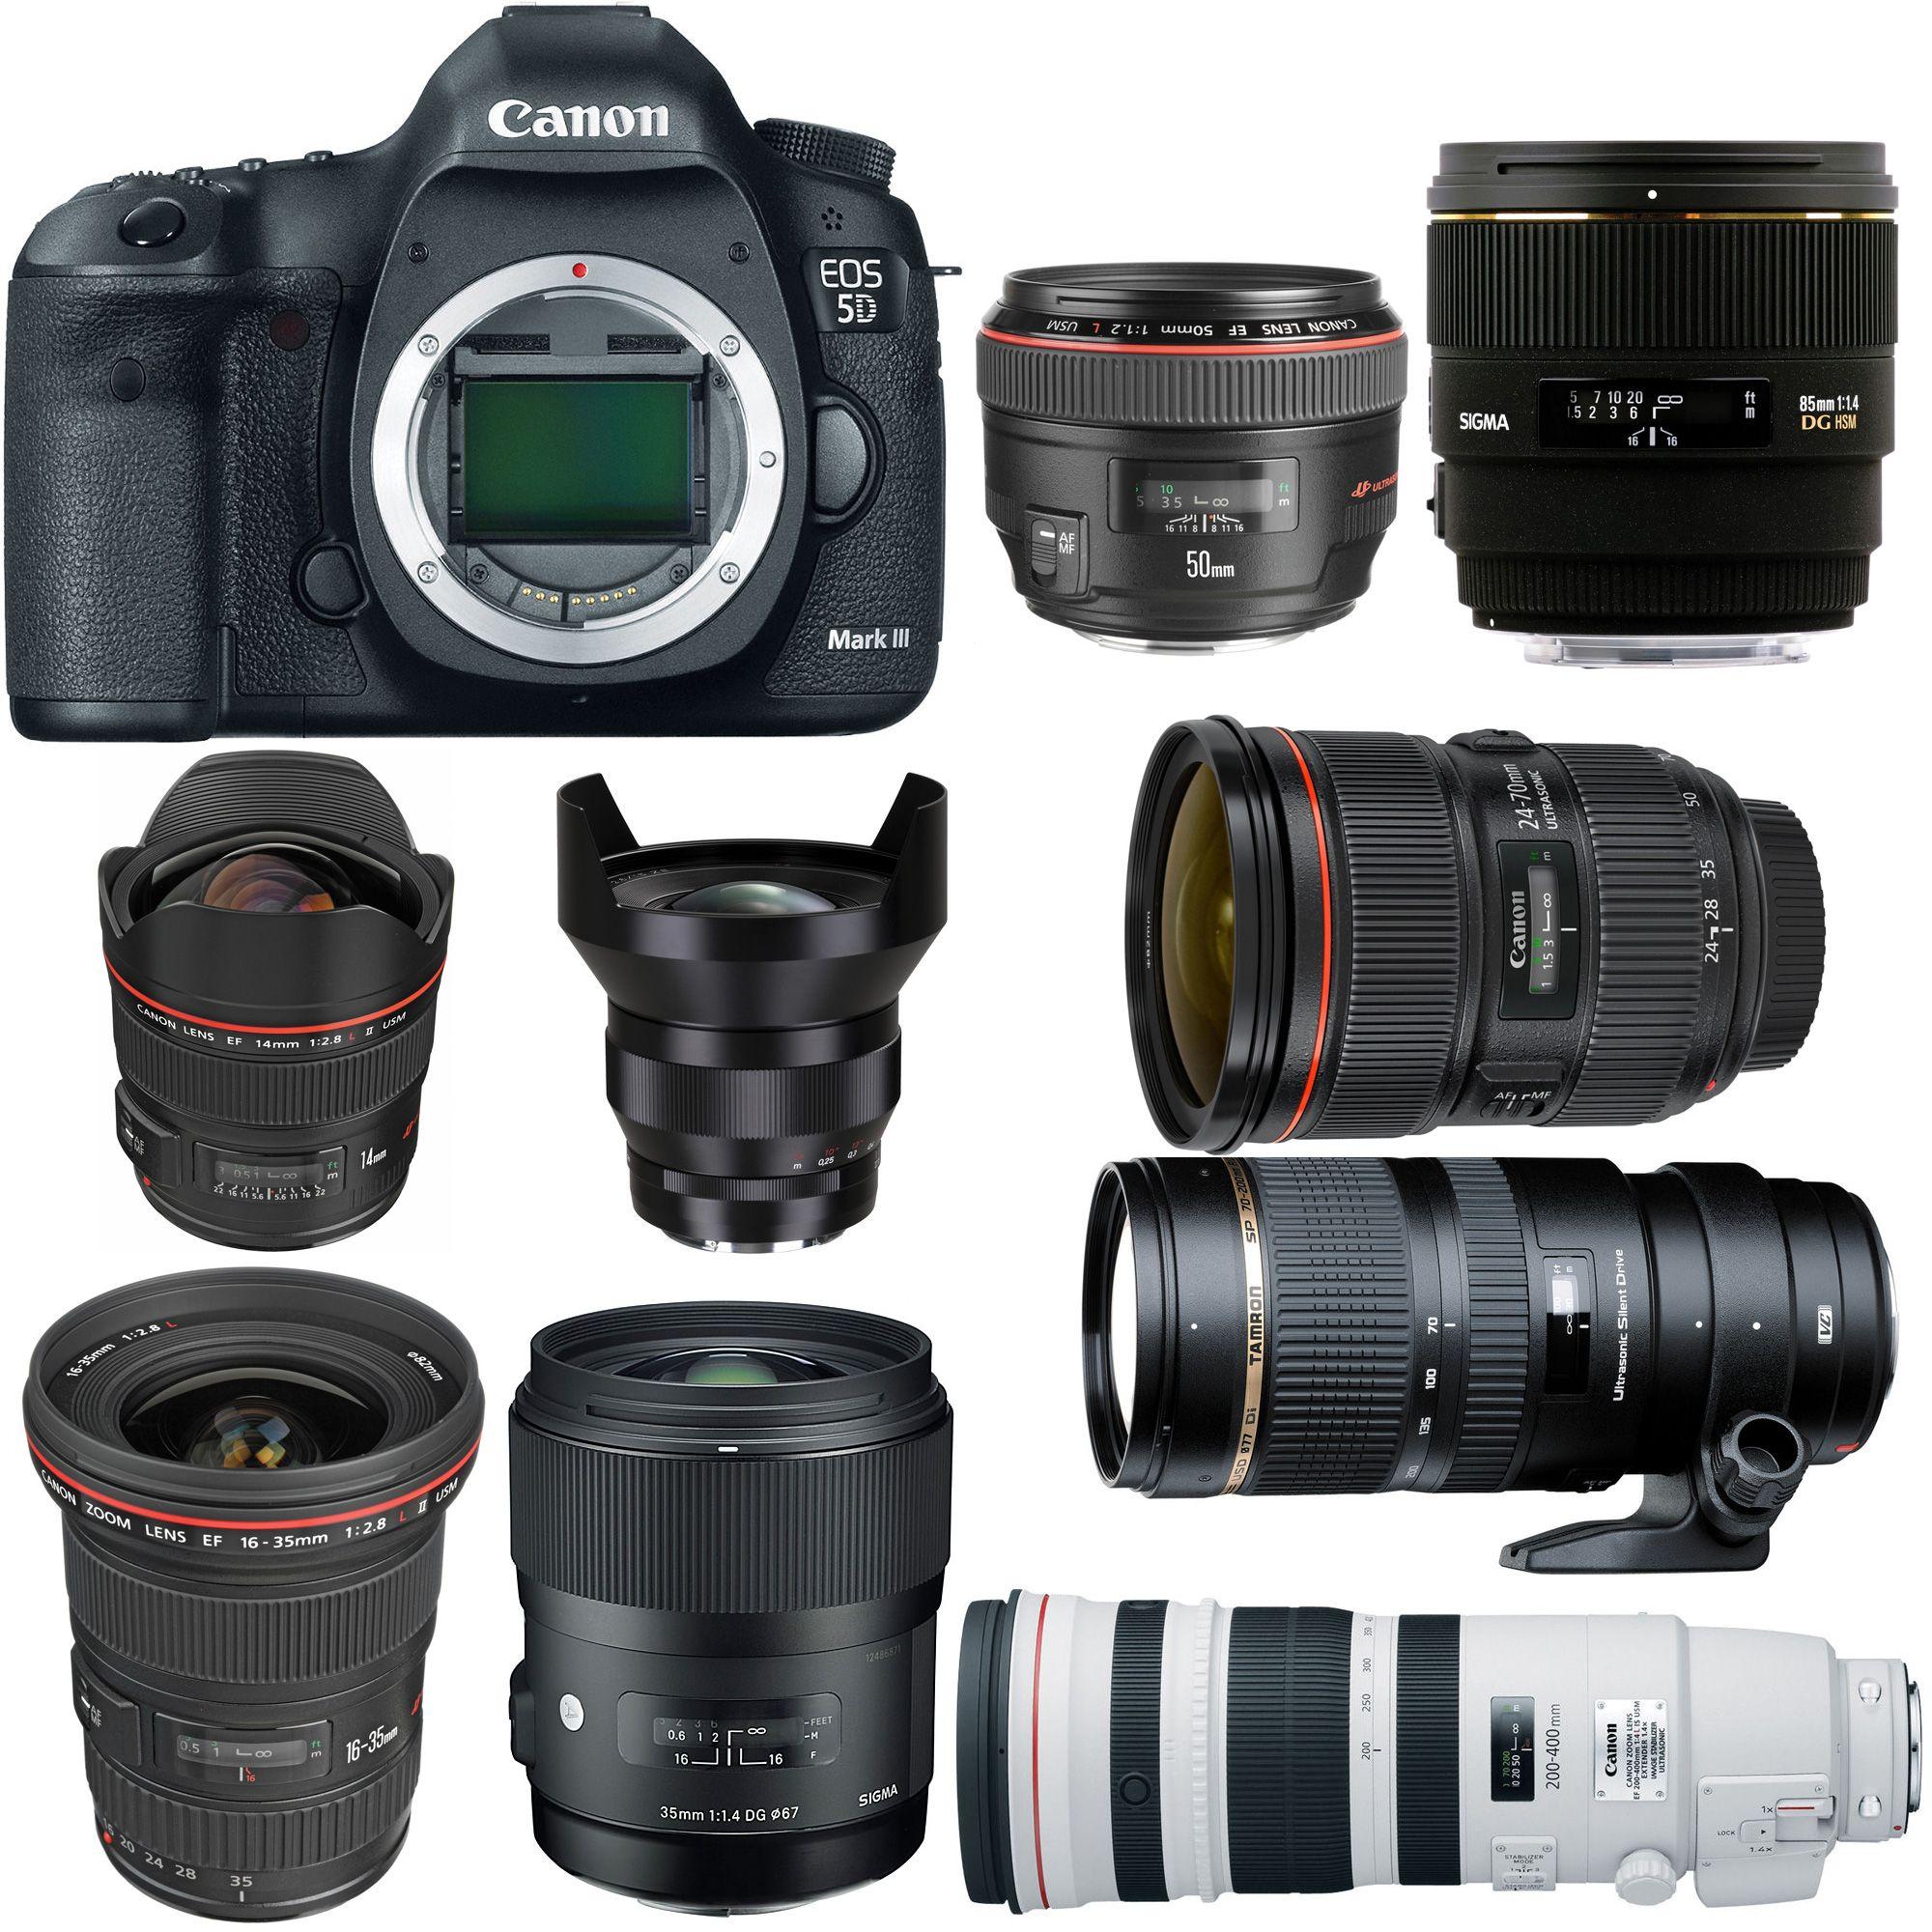 Best Lenses For Canon Eos 5d Mark Iii Canon Lens Dslr Photography Tips Canon Eos